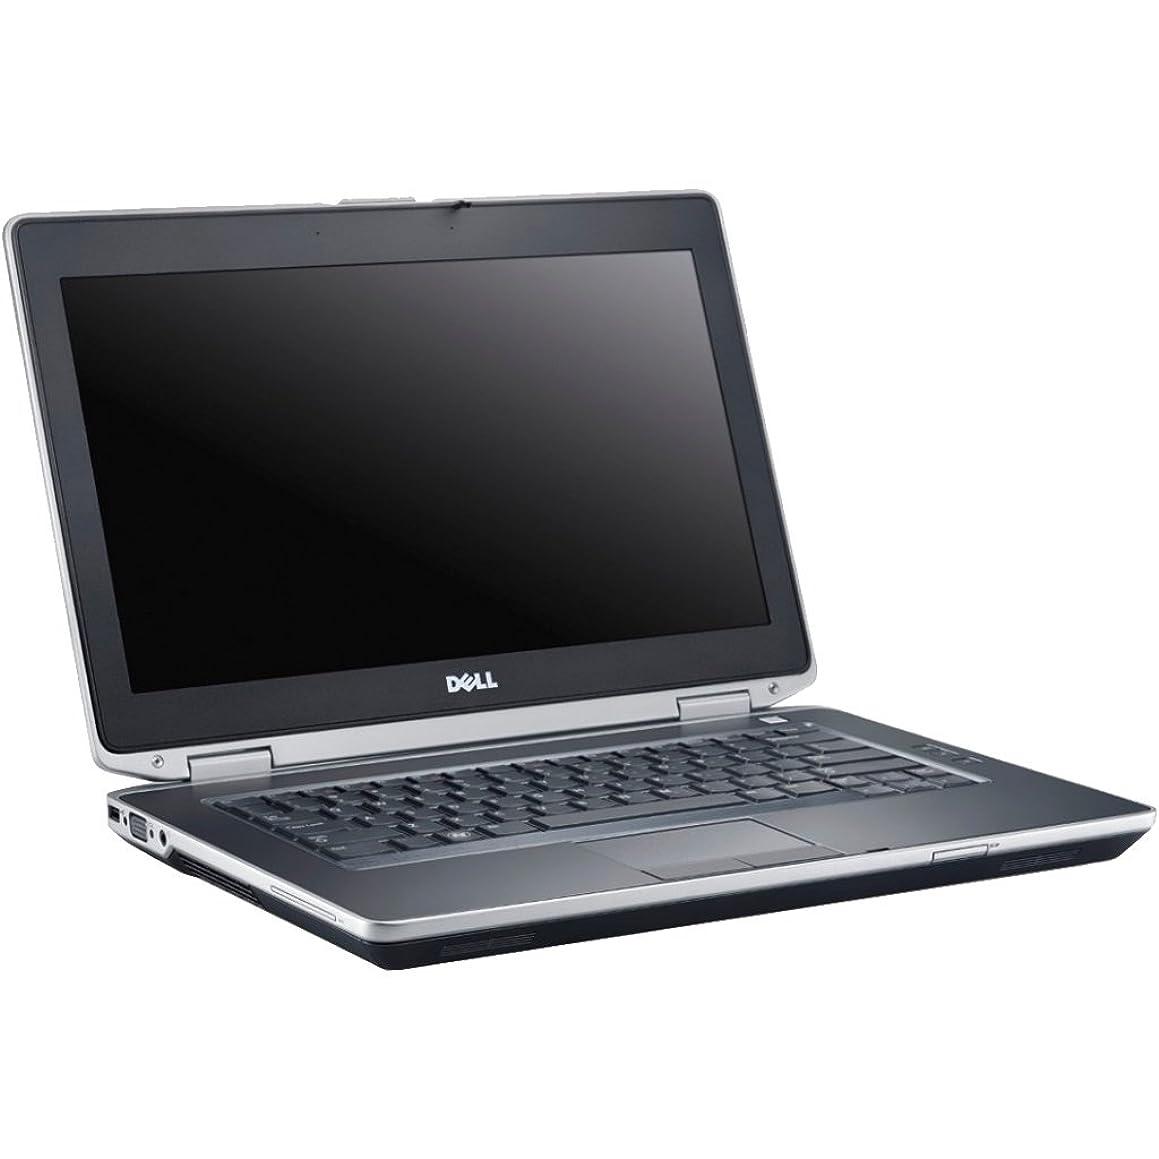 "Dell Latitude E6430 14"" Business Laptop PC, Intel Core i7 Processor, 4GB DDR3 RAM, 320GB HDD, DVD+/-RW, Windows 10 Professional (Renewed) (4GB RAM, 320GB HDD)"